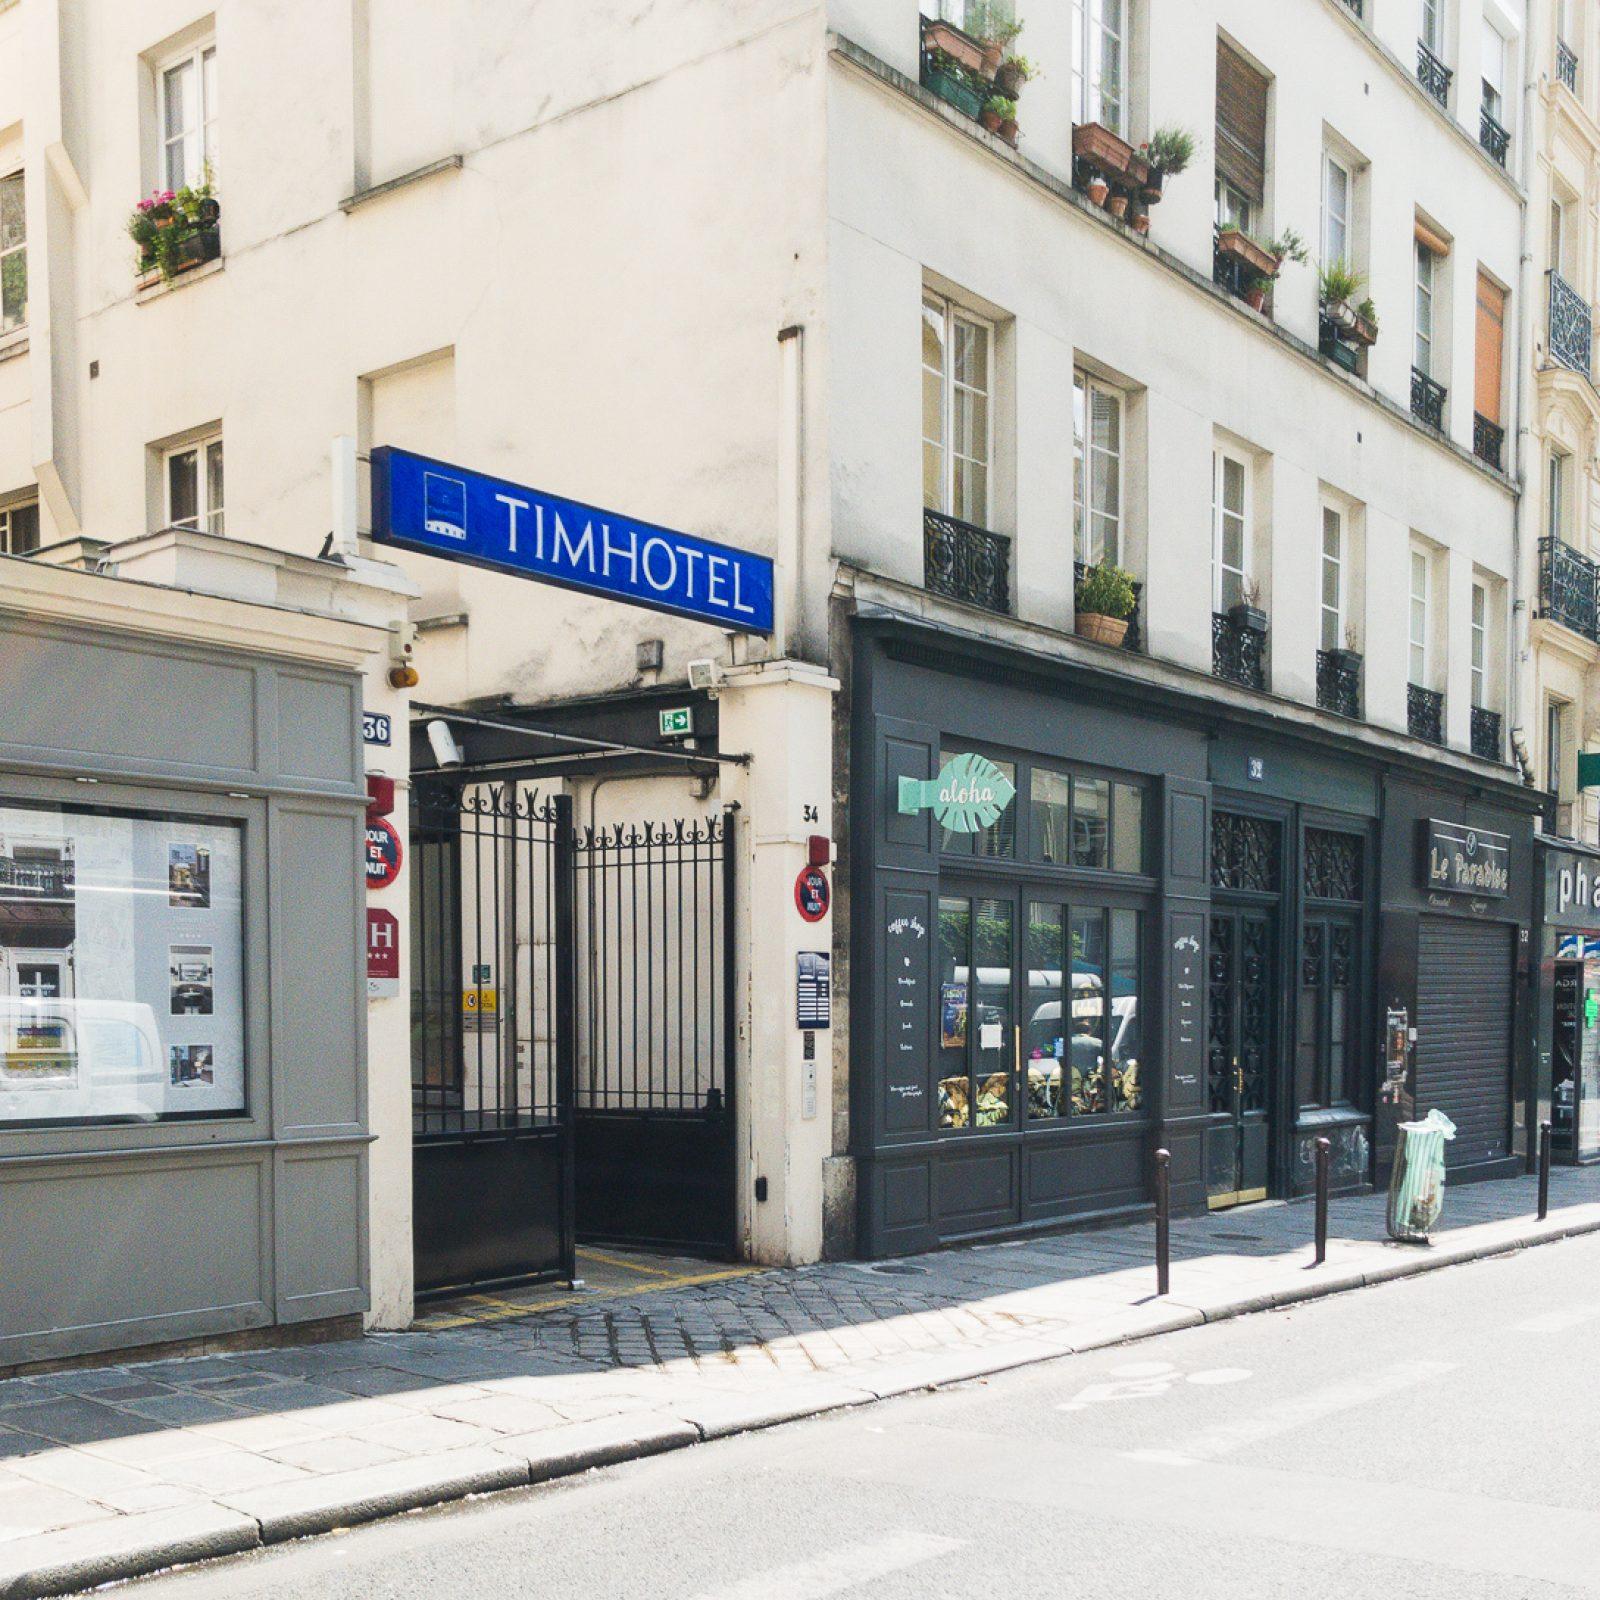 tim-hotel opera blanche hotel parigi 019